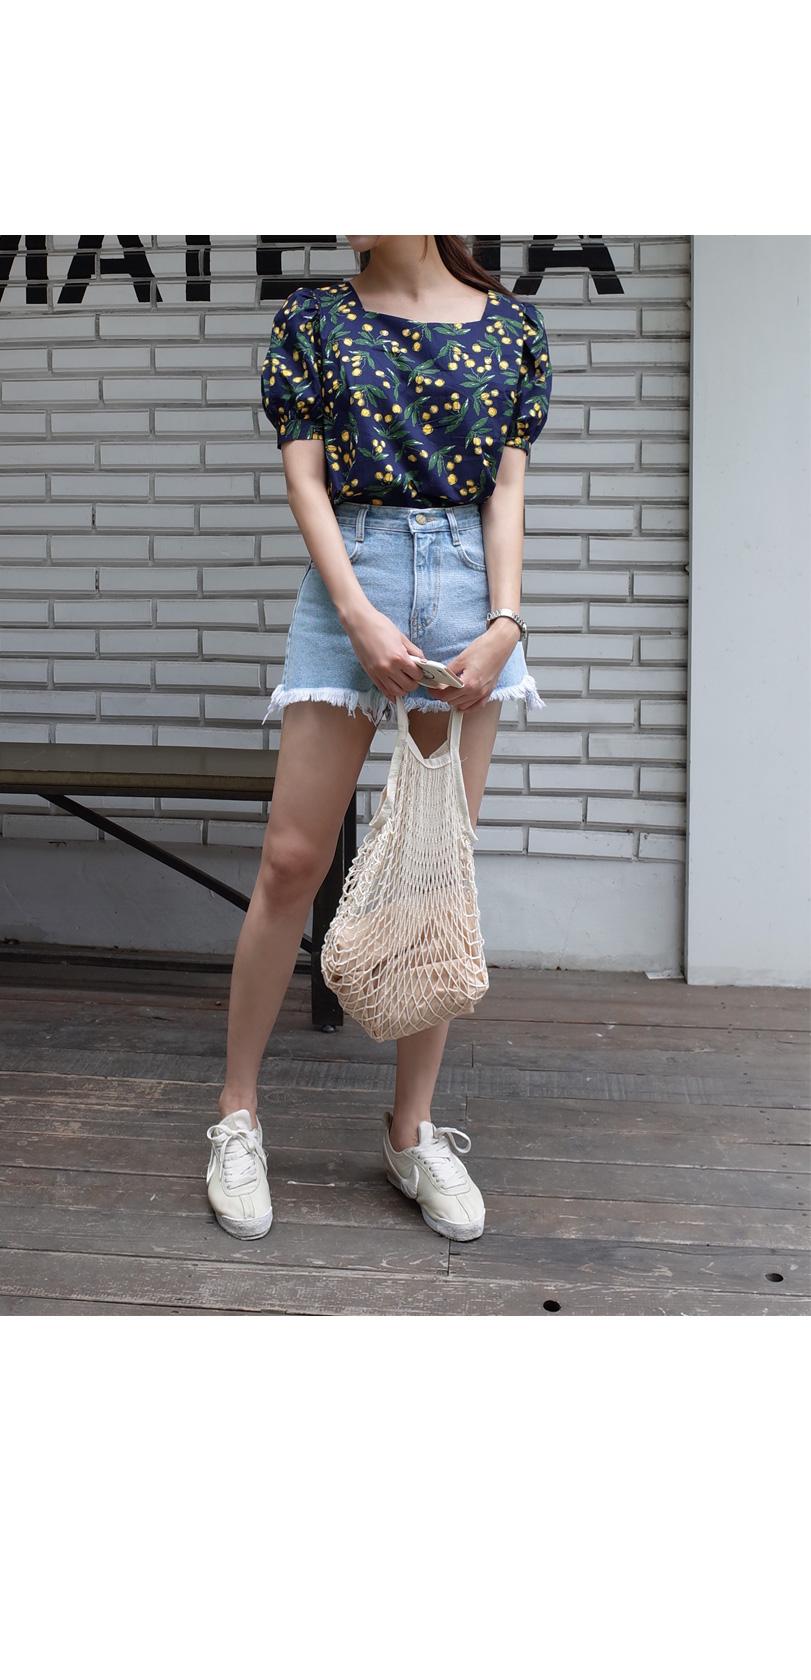 Cherry puff blouse